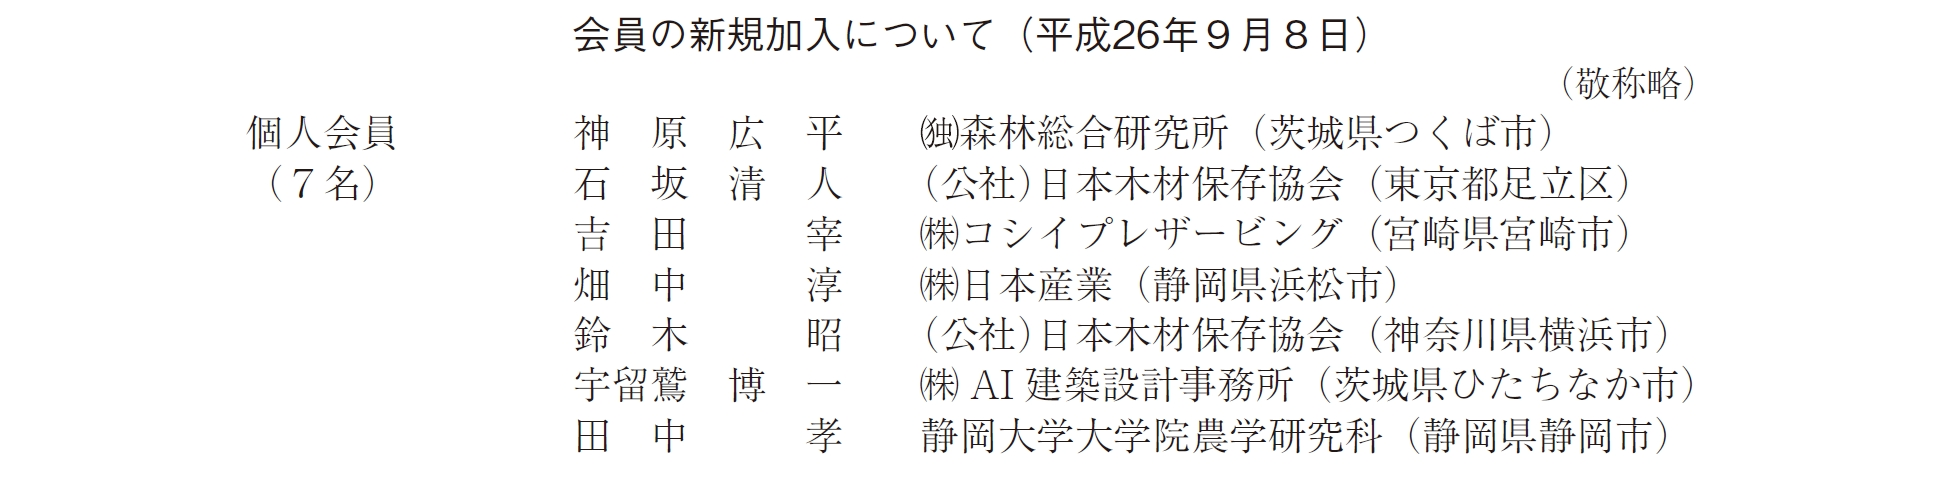 http://www.mokuzaihozon.org/about/jwpa_news/WS000003.JPG